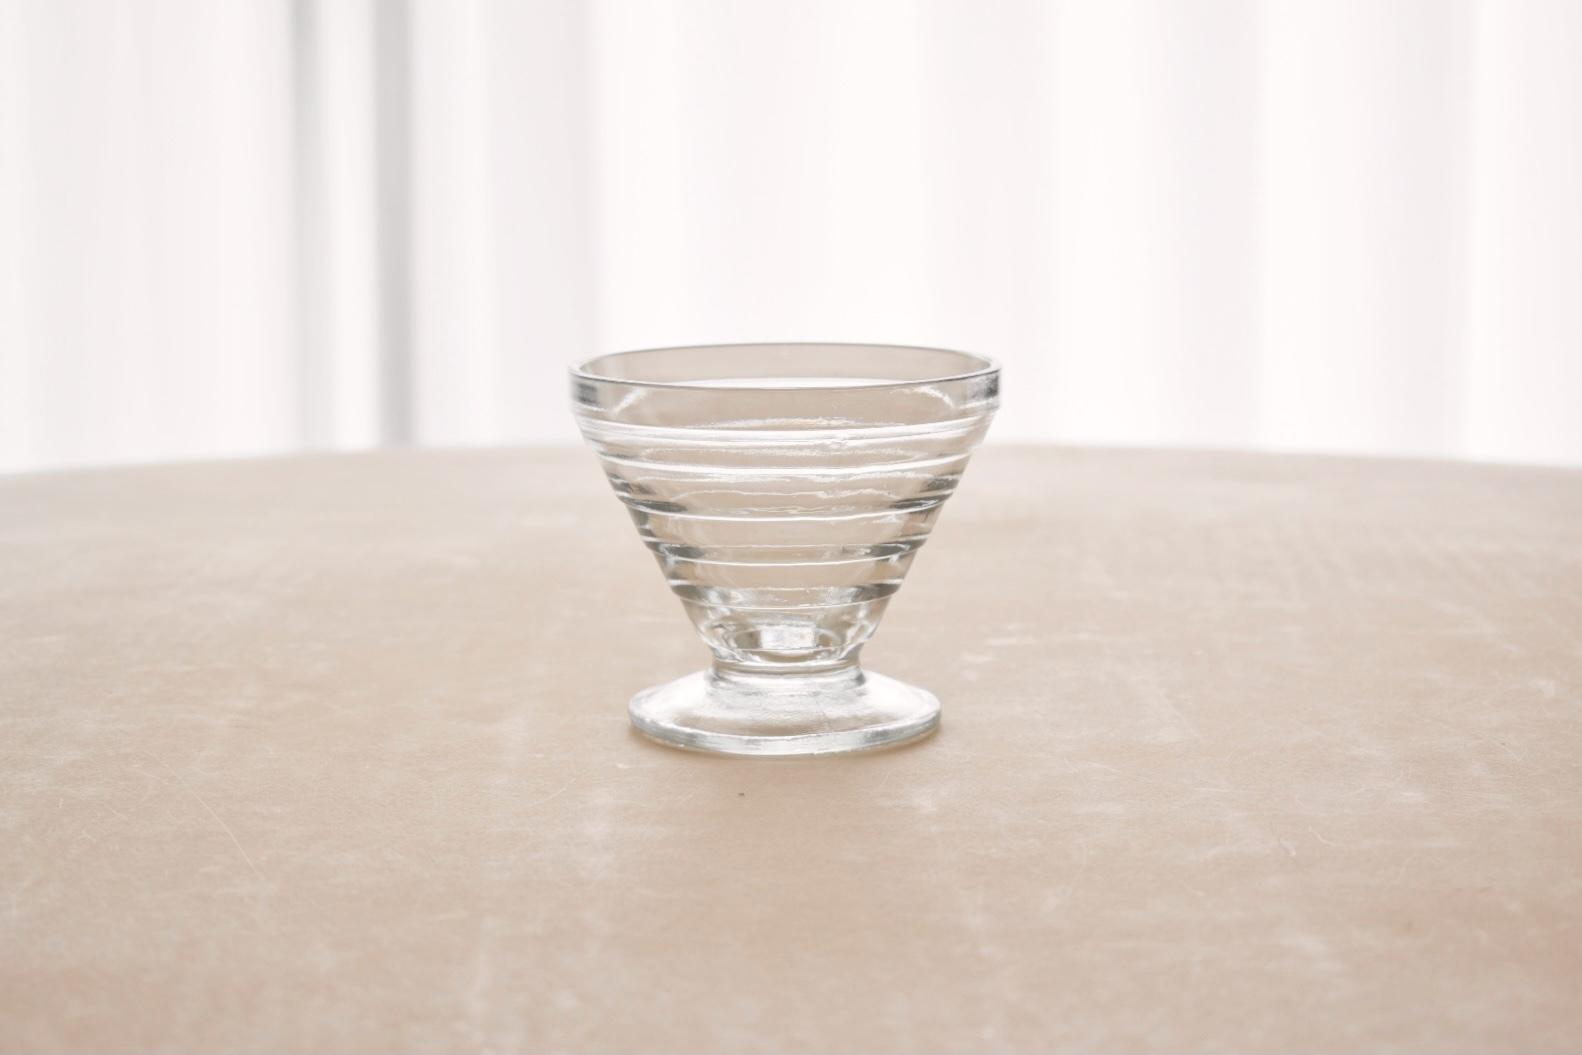 Riihimaen Lasi dessert glass(Aino Aalto)